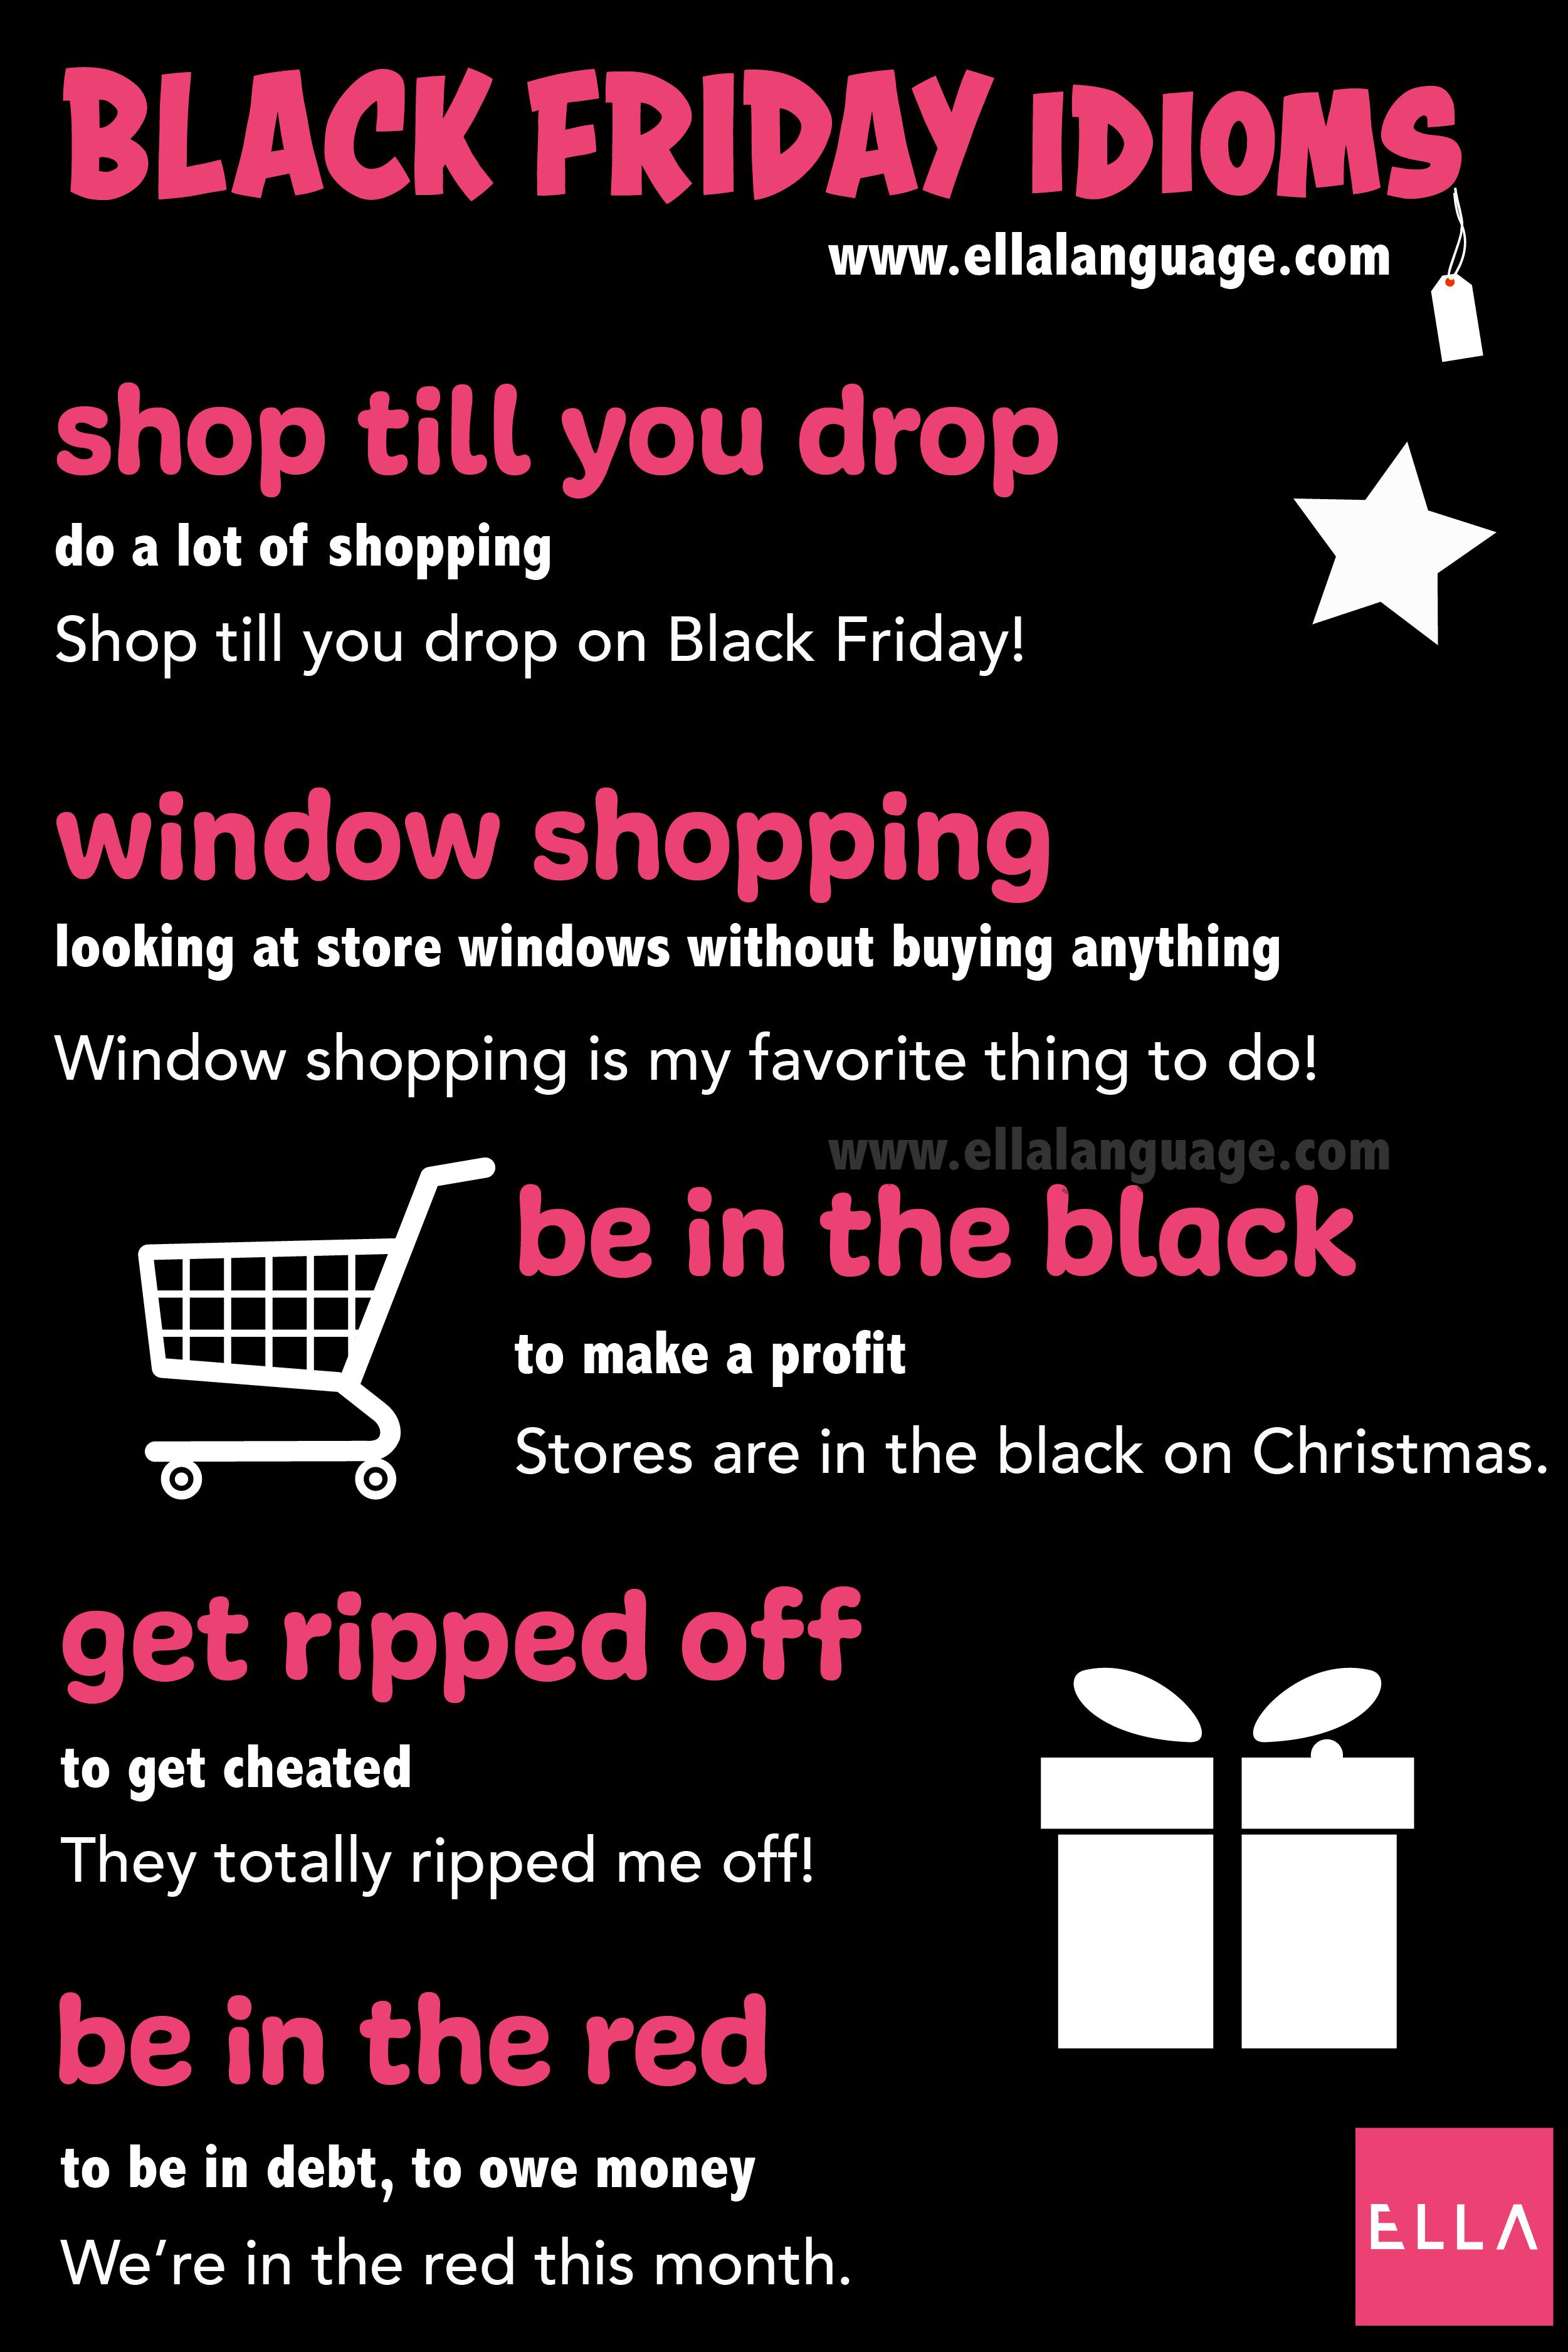 Black Friday Idioms For Esl Blackfriday Idioms Esl